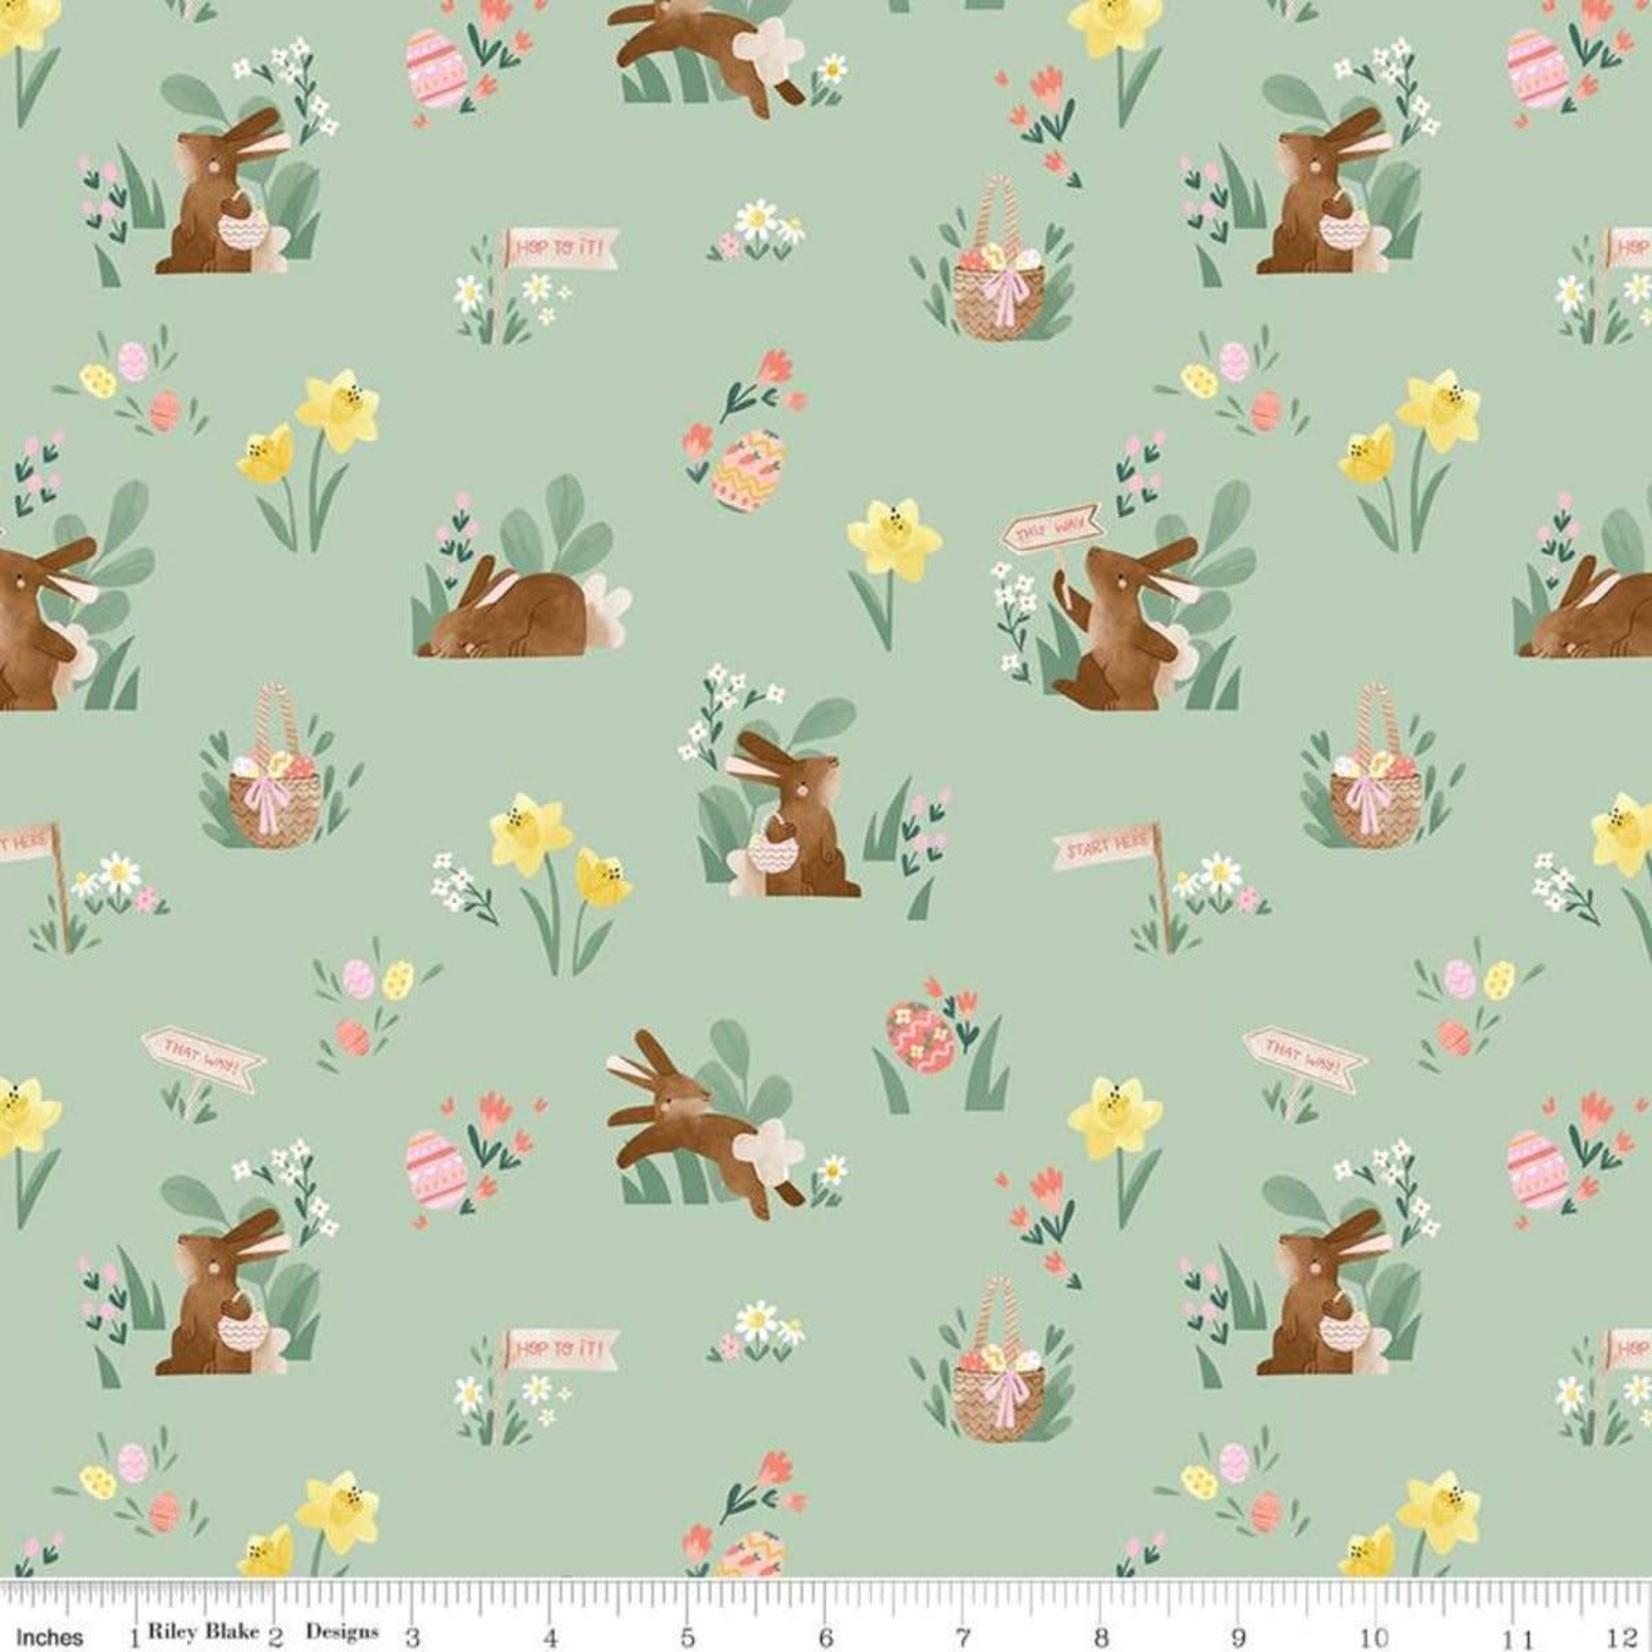 RILEY BLAKE DESIGNS Easter Egg Hunt, Bunnies & Baskets Main, Mint $0.20 per cm or $20/m